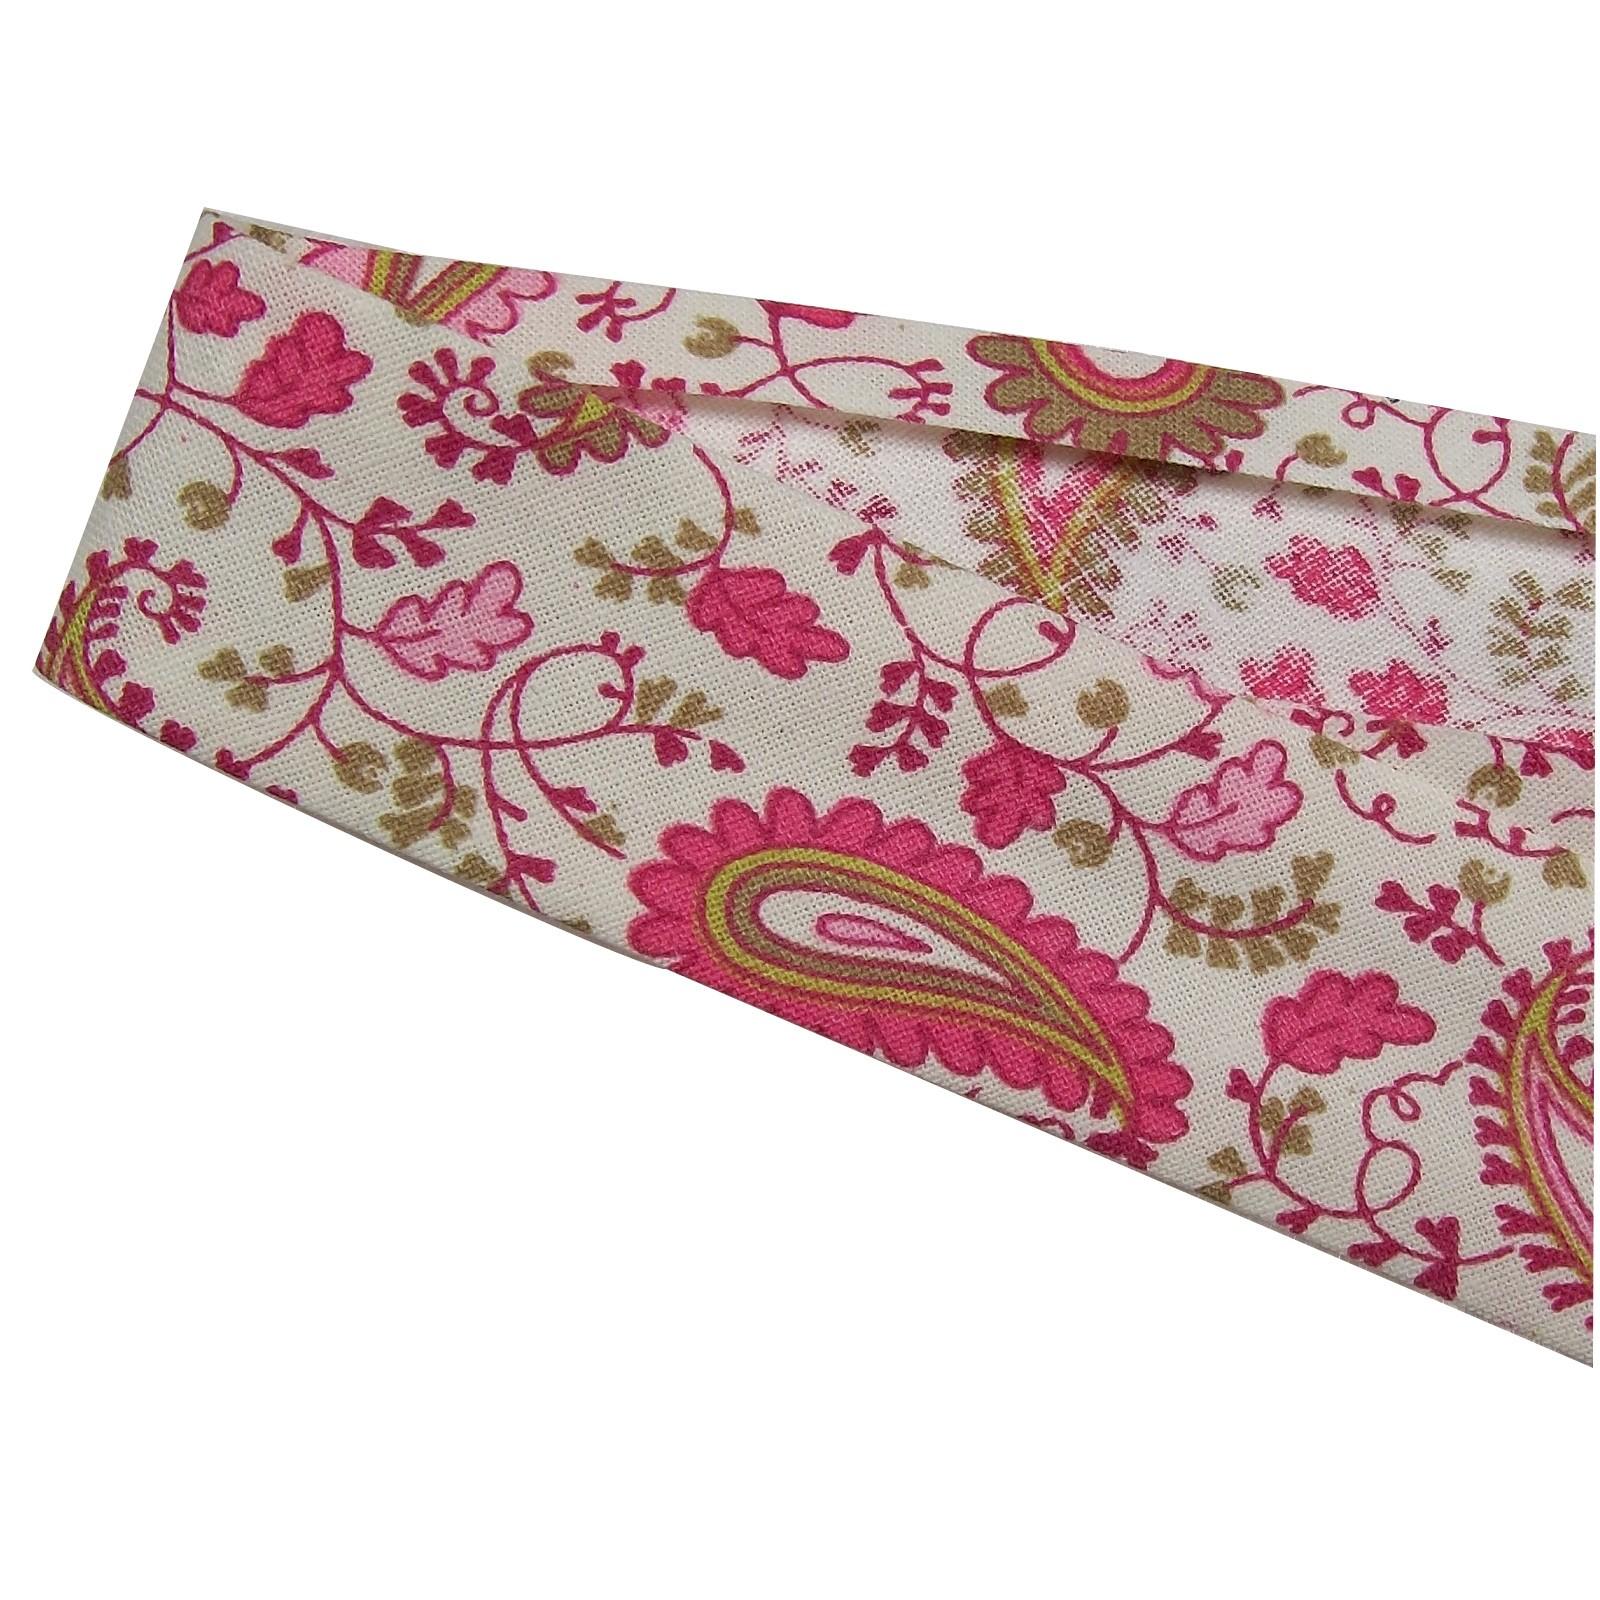 Bias Binding Patterned Cotton 25mm wide Pink Paisley 2 metre length